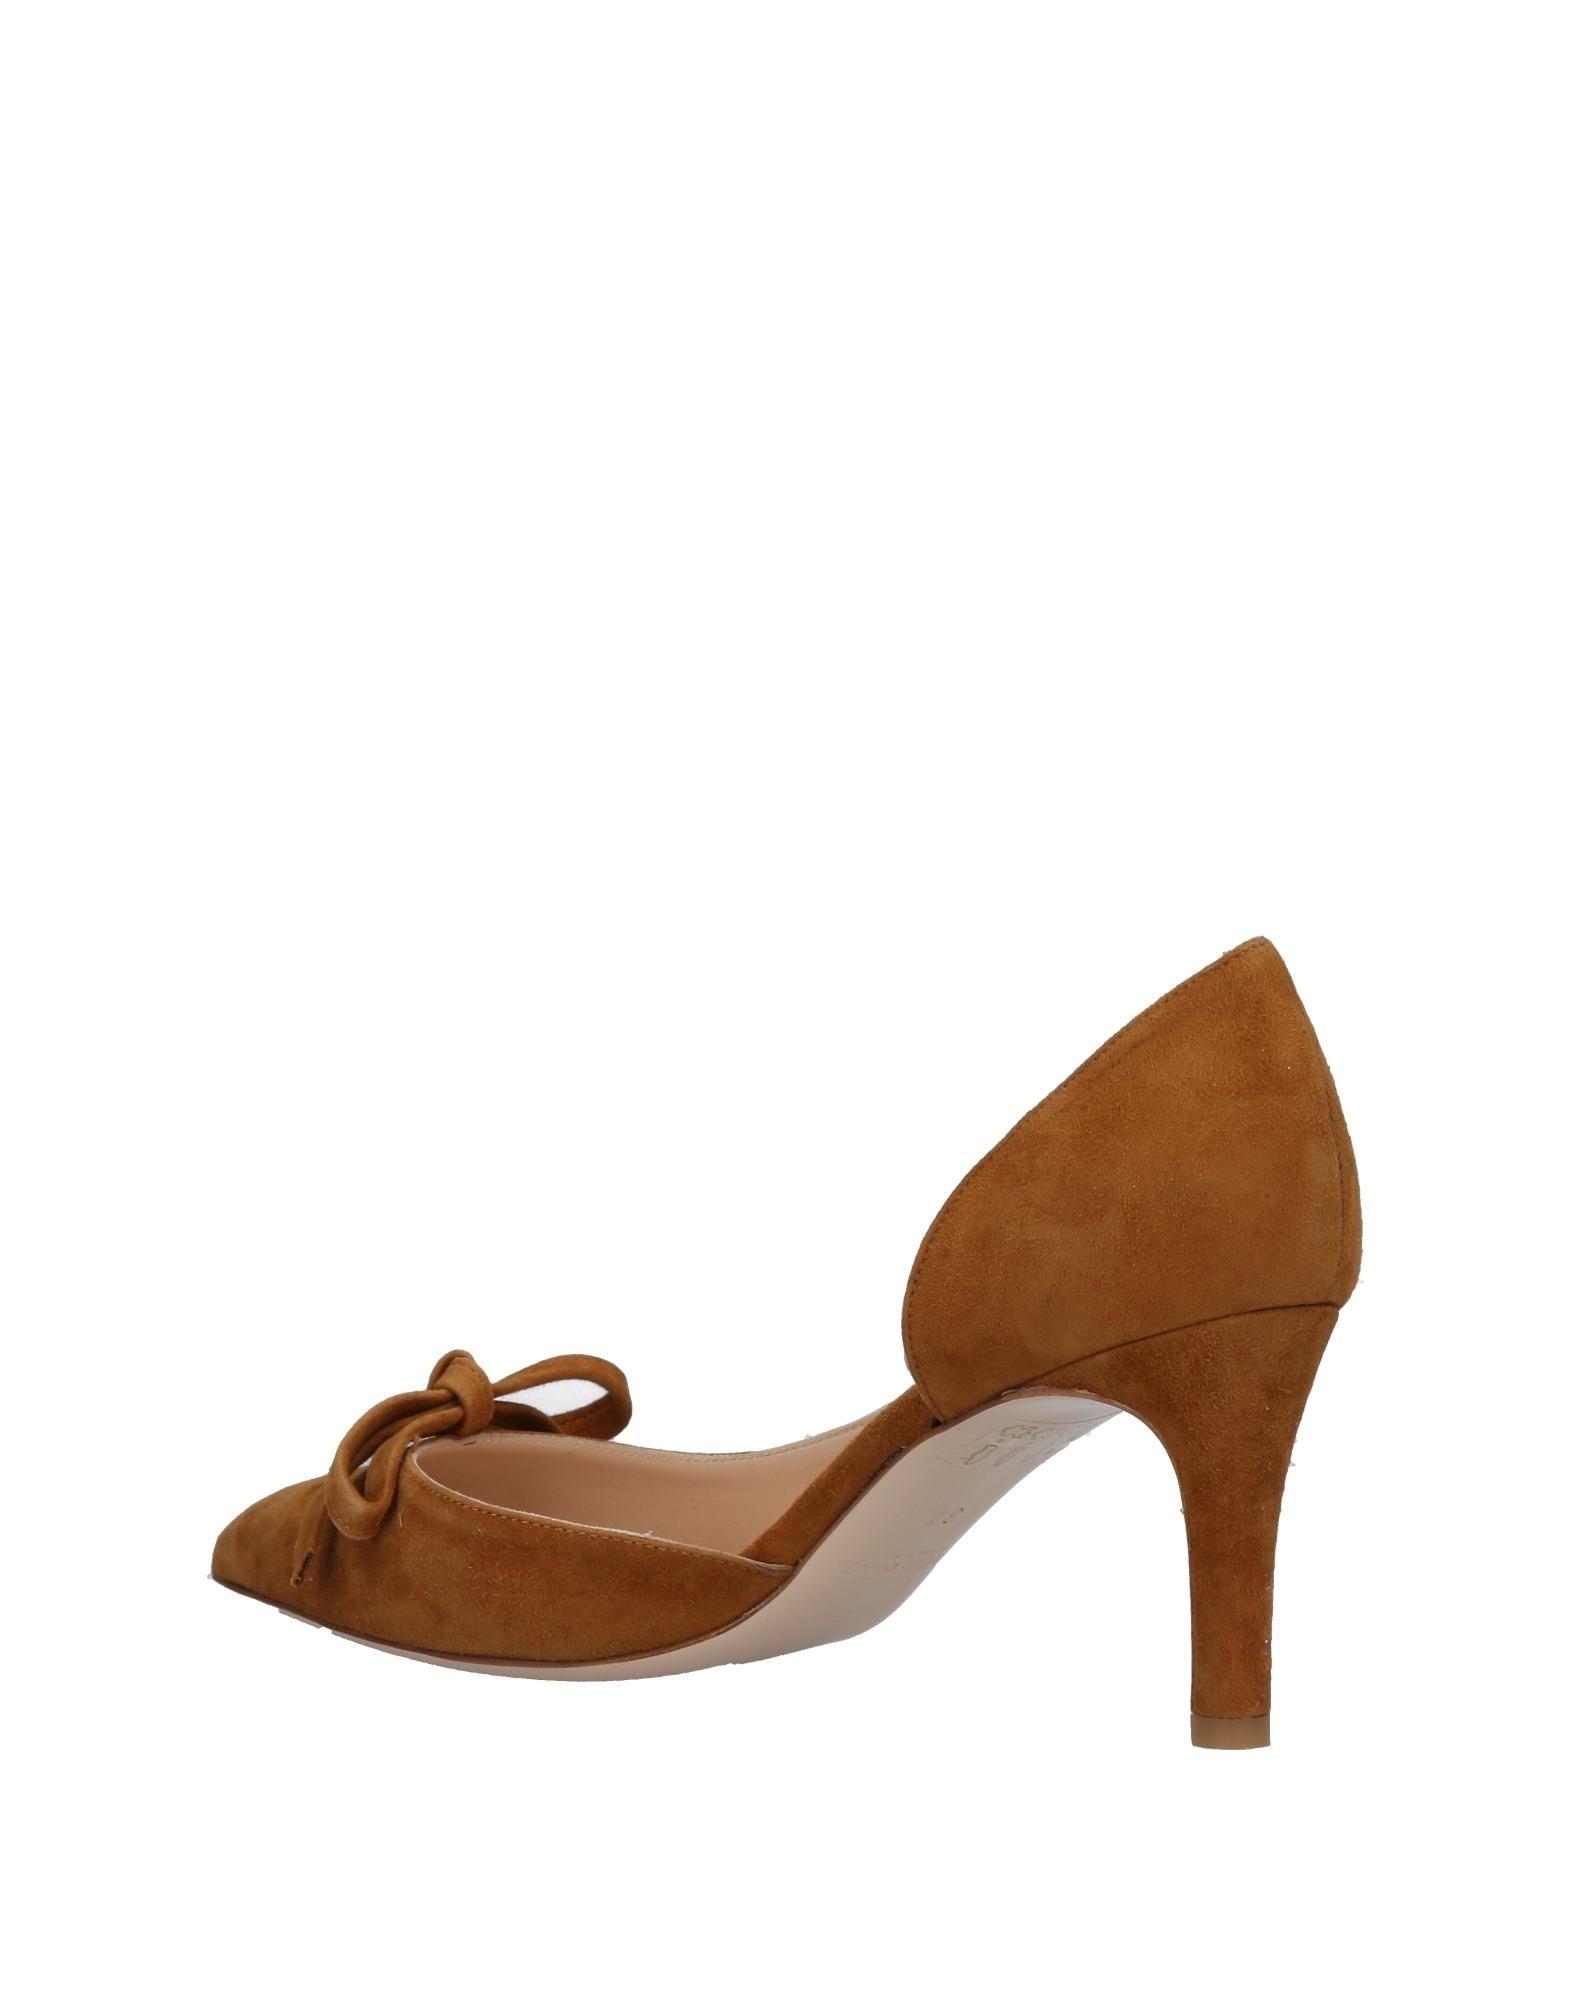 Festa Milano Gute Pumps Damen  11456478LO Gute Milano Qualität beliebte Schuhe a4fad8